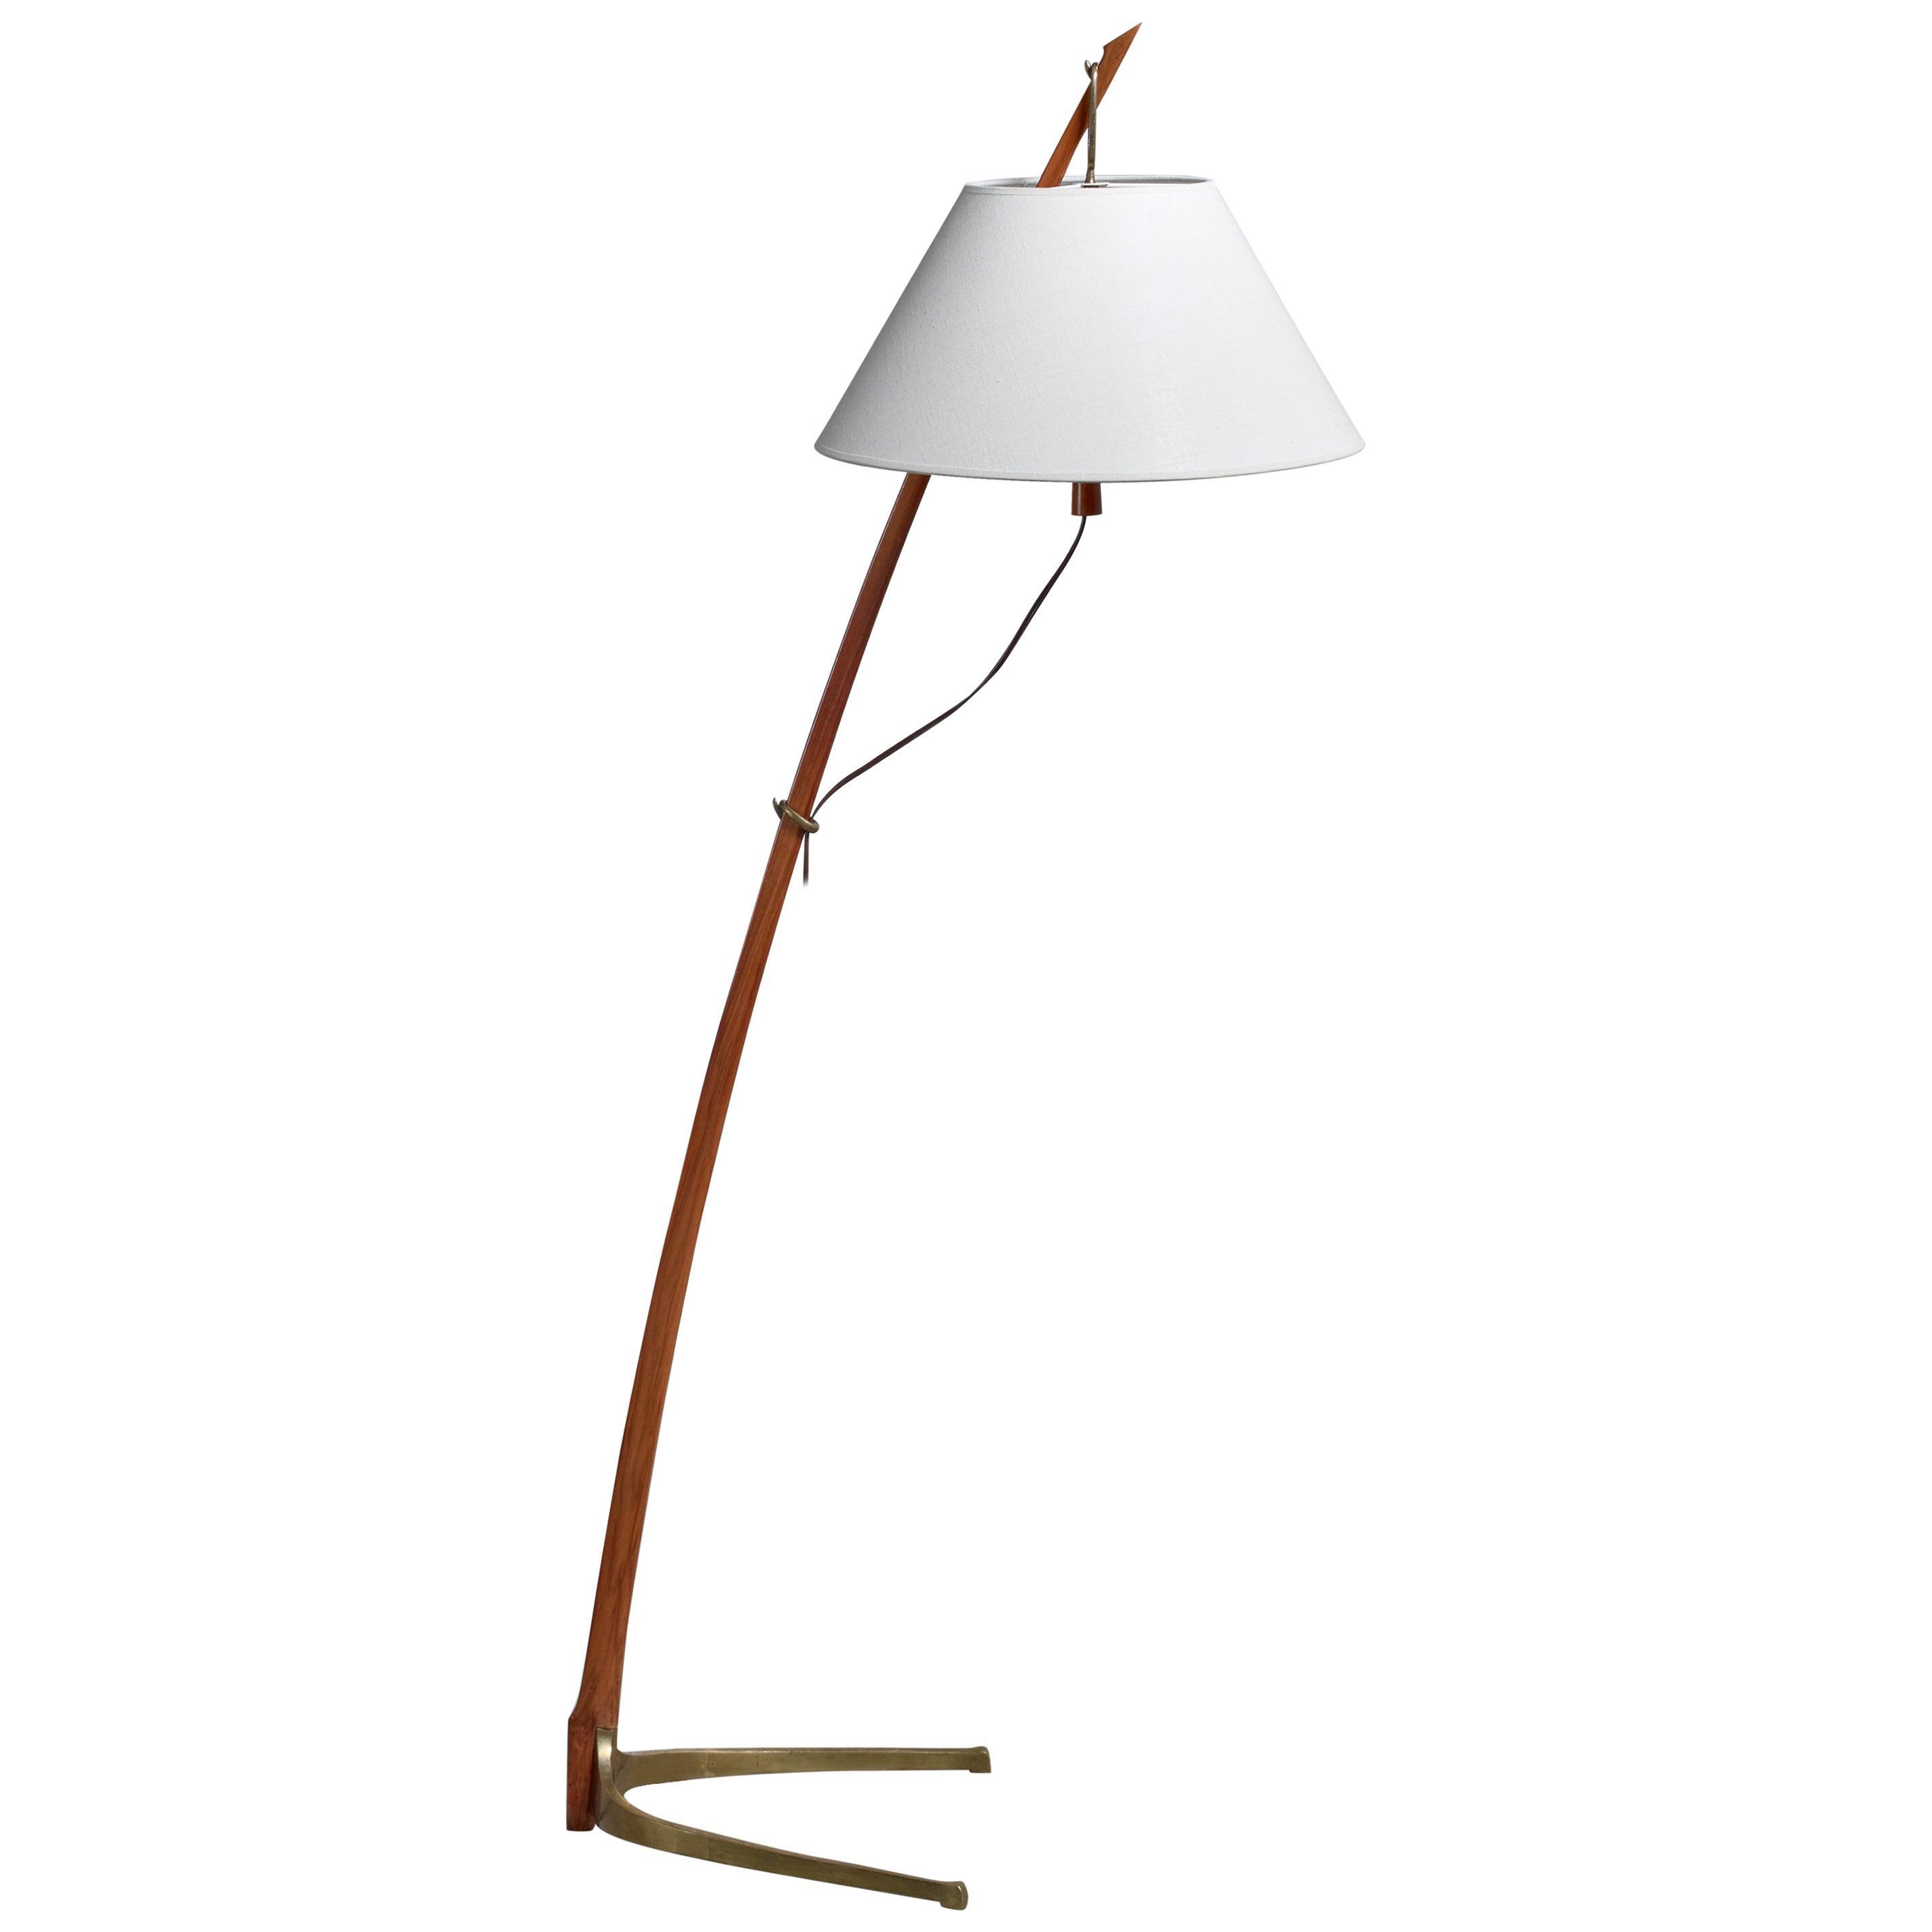 Kalmar Dornstab Floor Lamp, Austria, 1940s